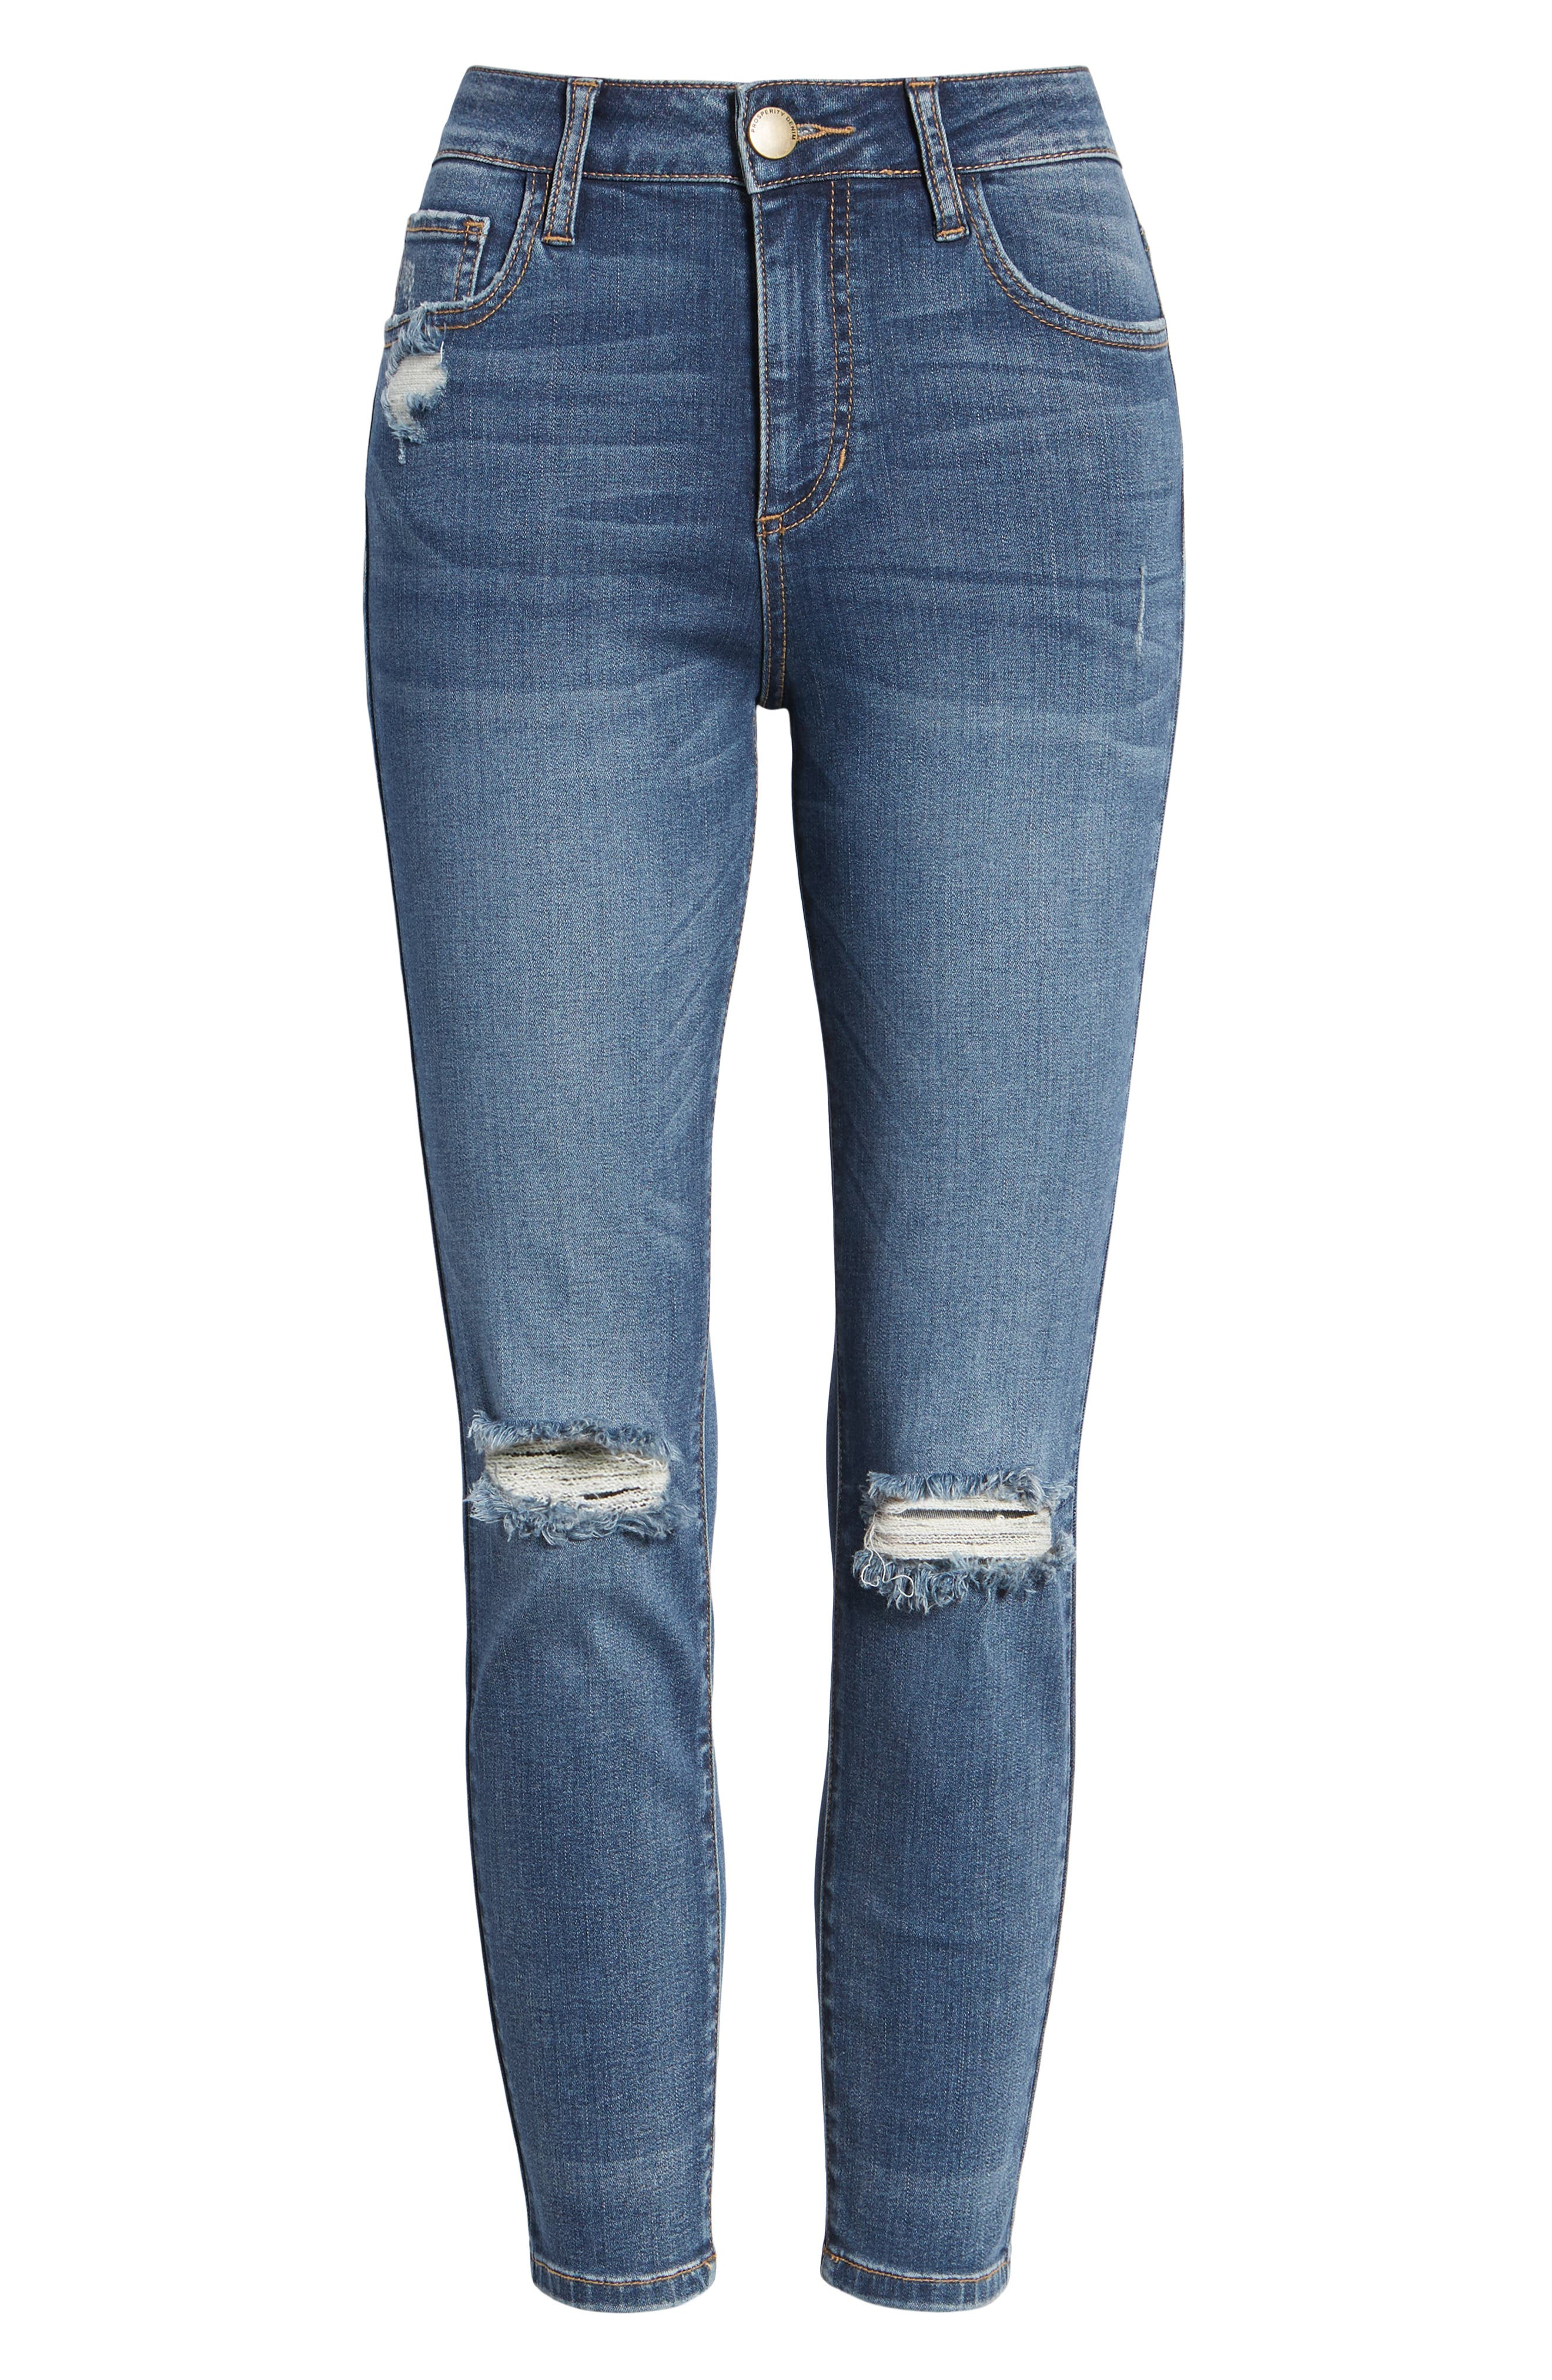 PROSPERITY DENIM,                             Ripped High Waist Skinny Jeans,                             Alternate thumbnail 7, color,                             RAYA WASH